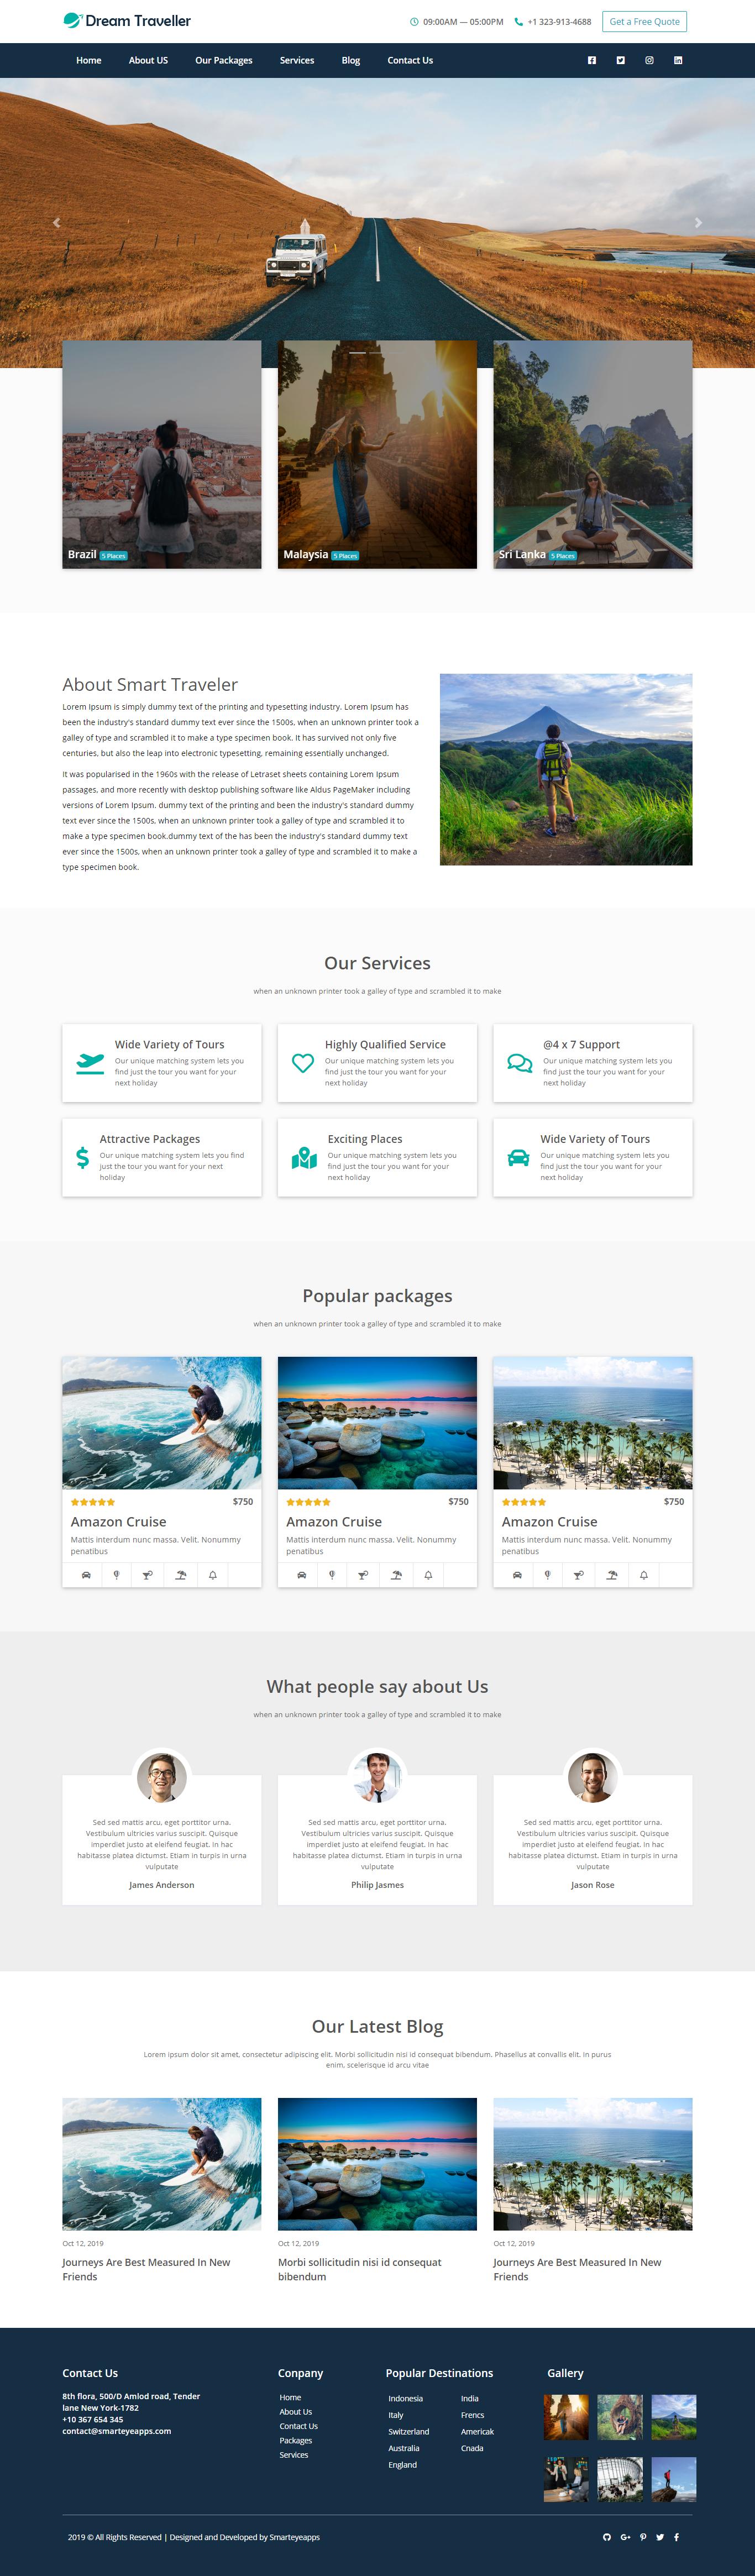 Free Travel Agency Website Template Travel Agency Website Interior Design Website Templates Portfolio Website Design